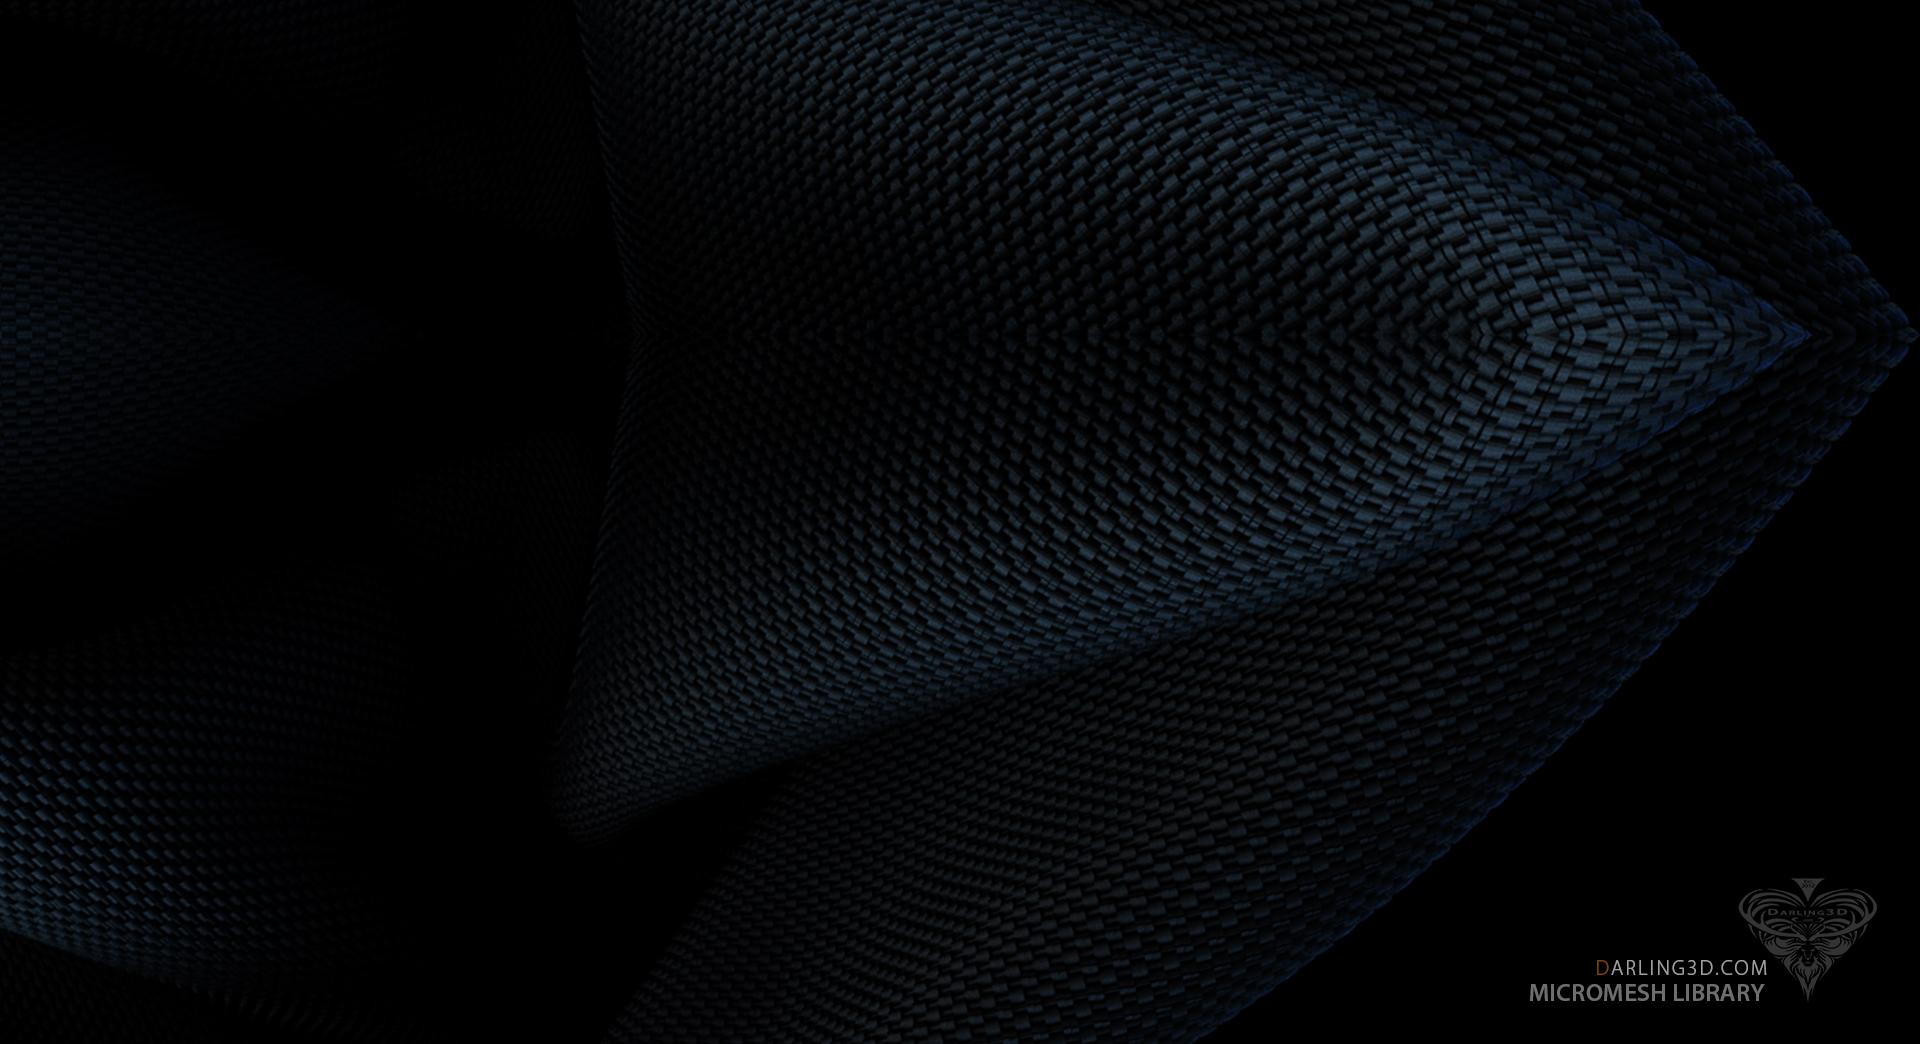 Micromesh_Desktop Background_07.jpg